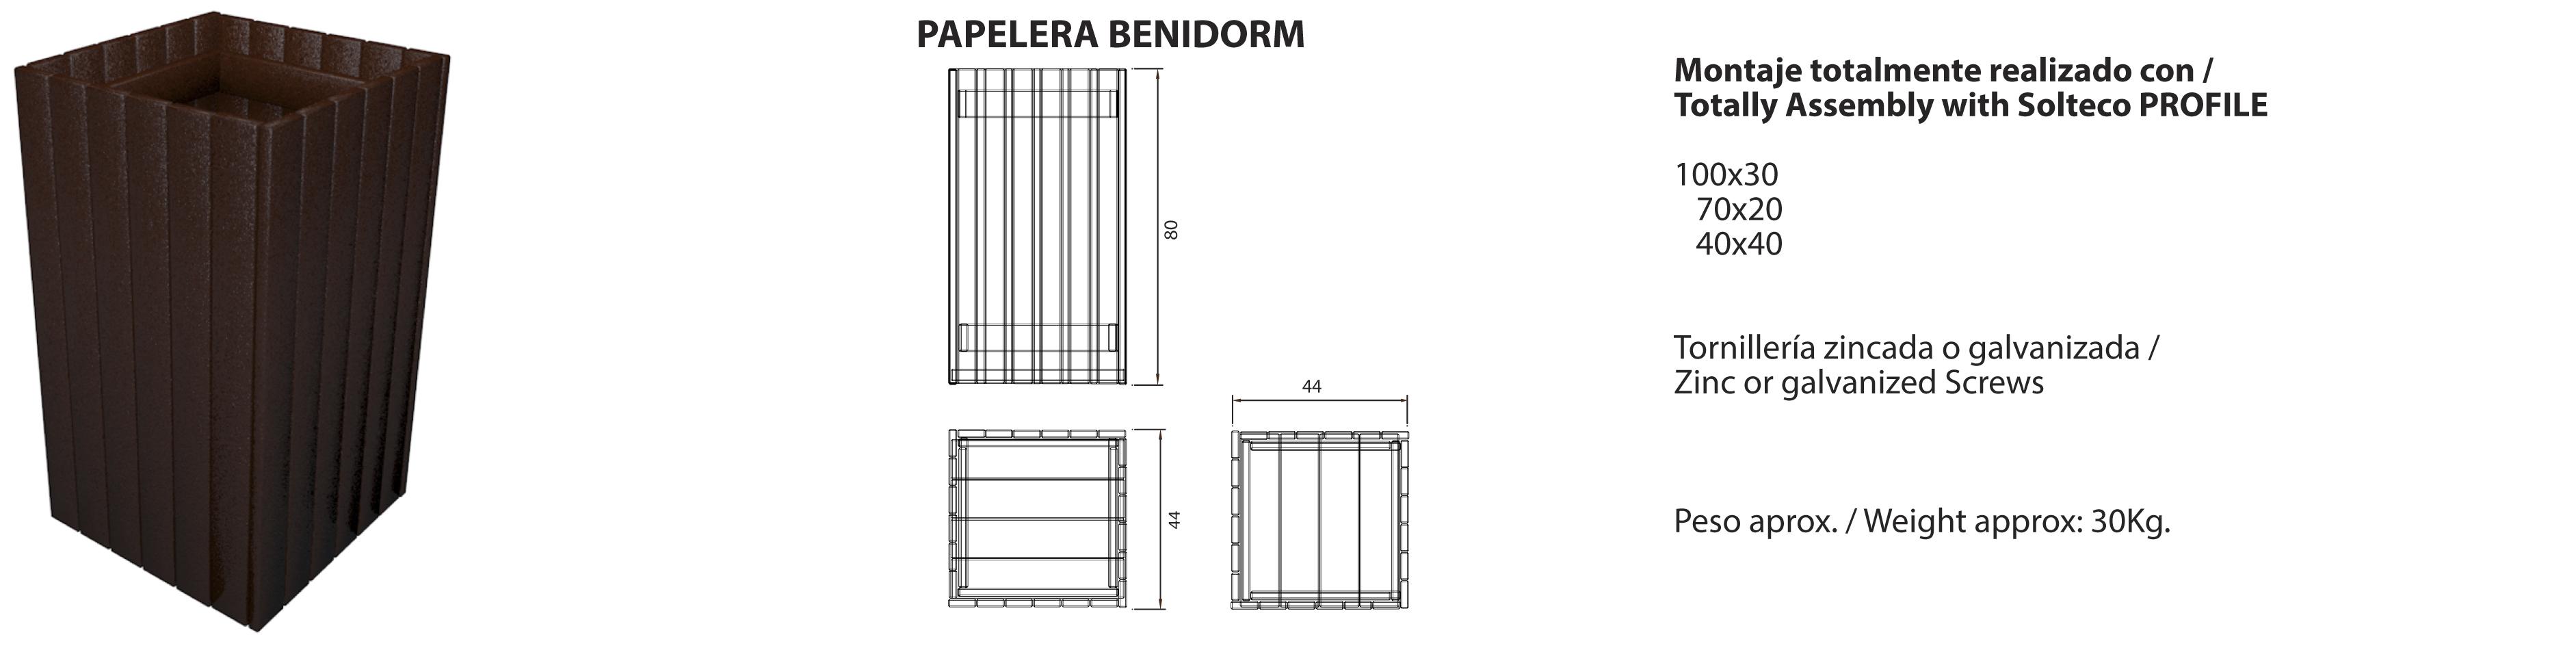 Papelera-Benidorm